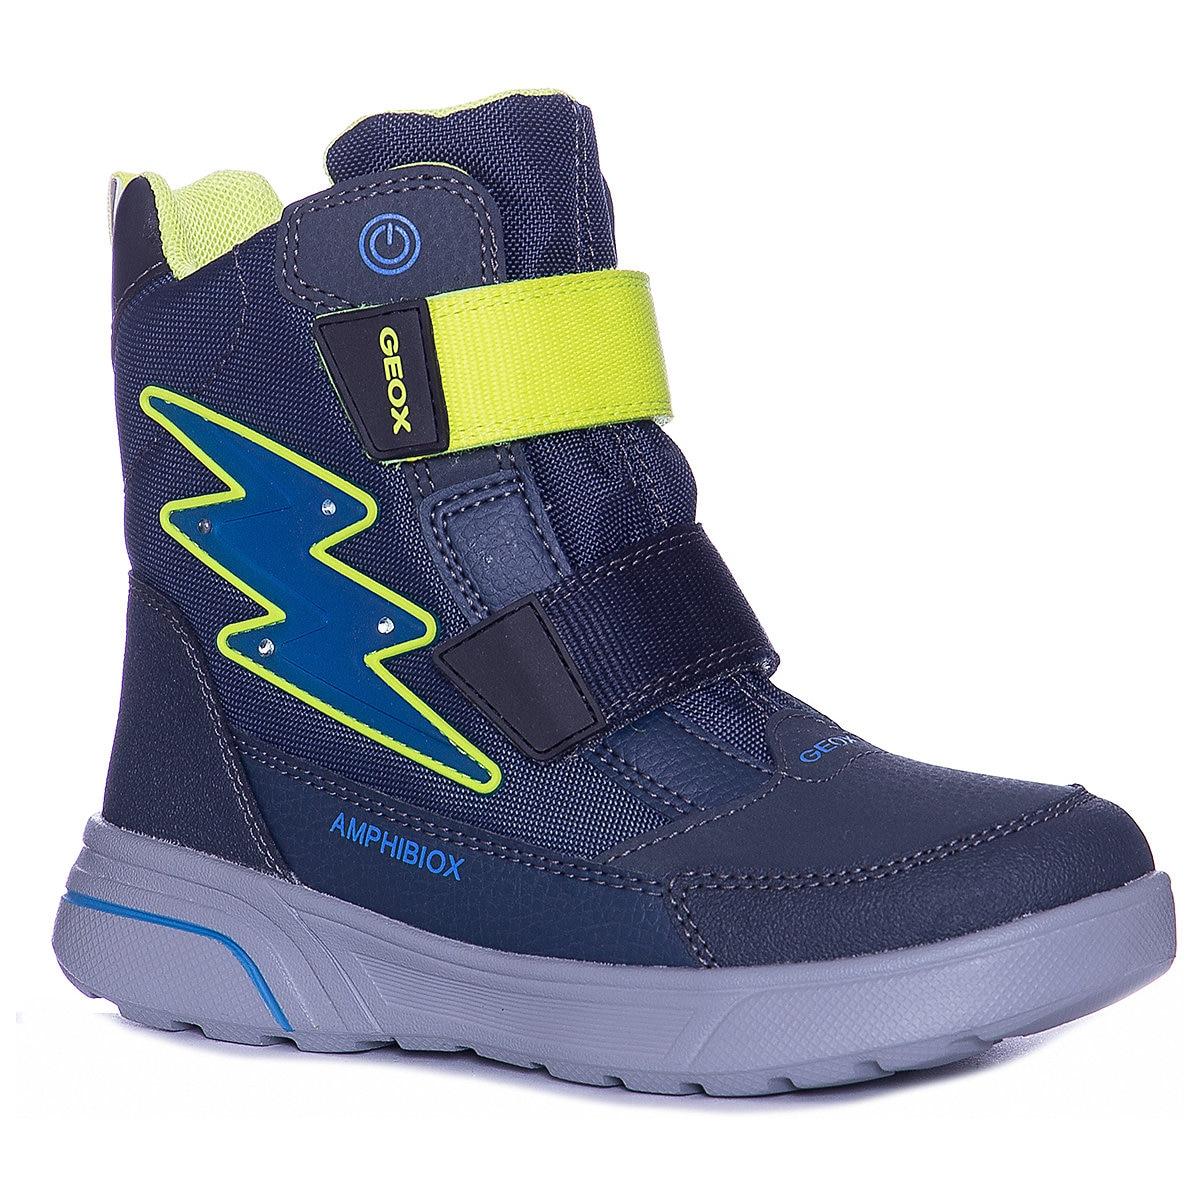 GEOX Boots 8786523 children shoes For boy Winter Boys faux fur MTpromo